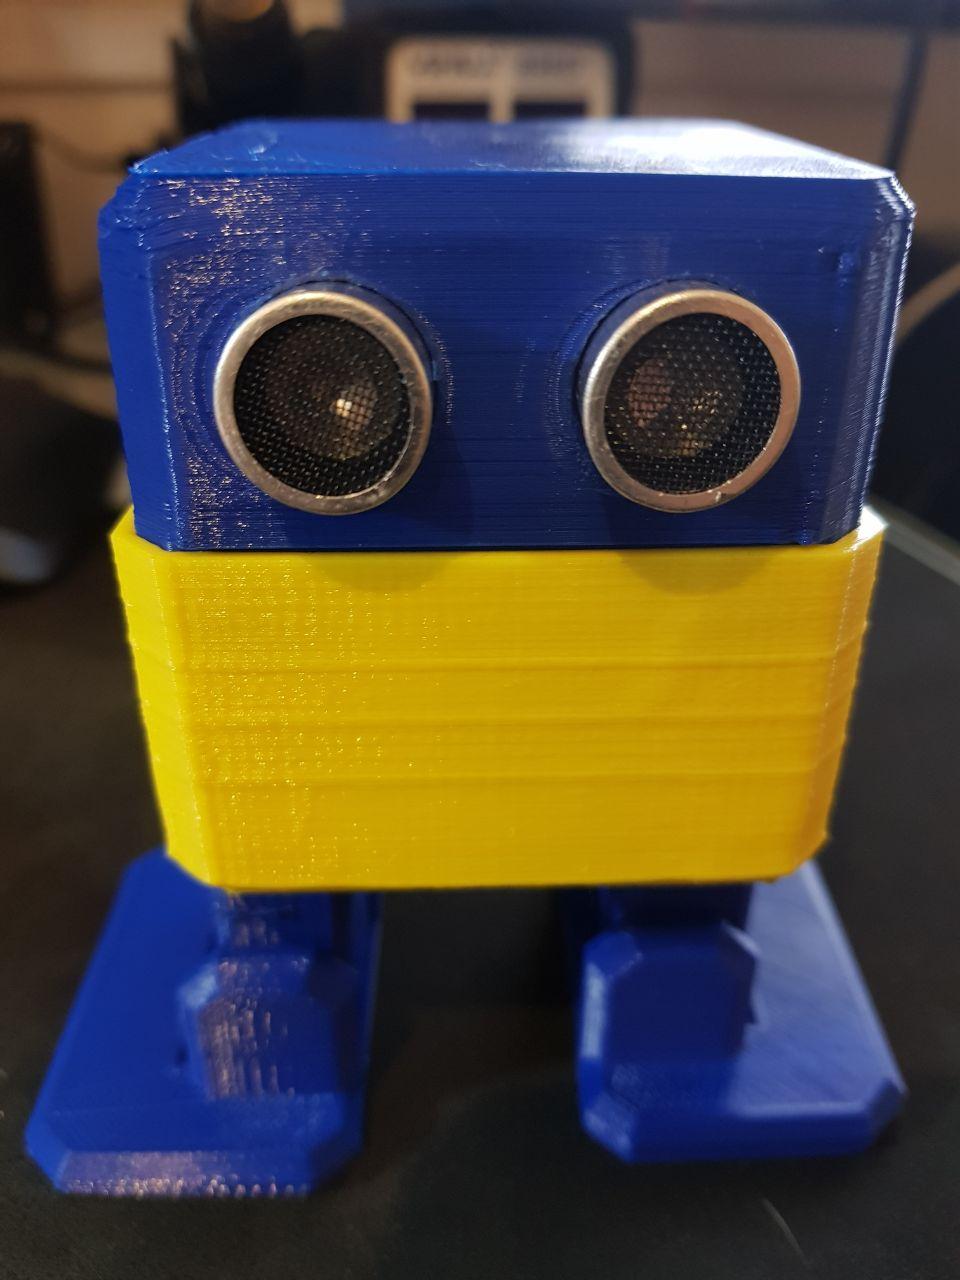 ad0f2911aa5 Kit P/ Armar Robot Otto BOCA Completo Baila Control Arduino – Candy-HO